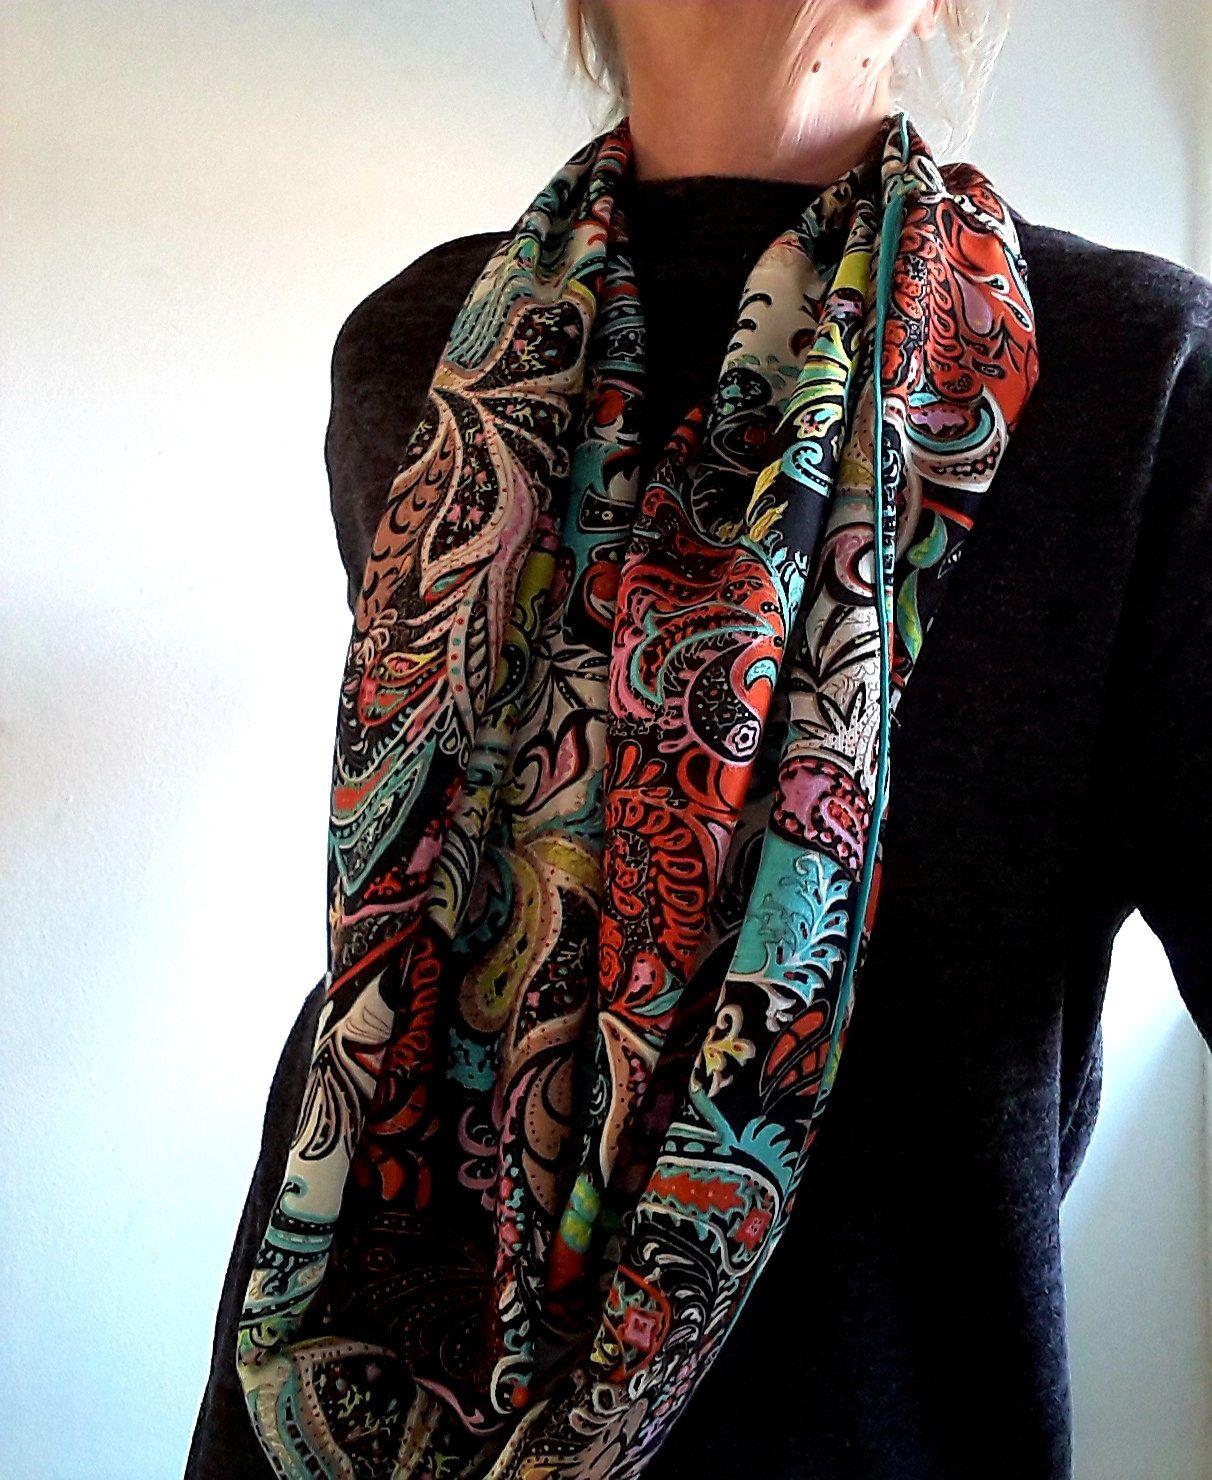 c9be931e083e8 Foulard femme,écharpe femme, accessoire femme, tissu viscose multicolore , motif  cachemire,